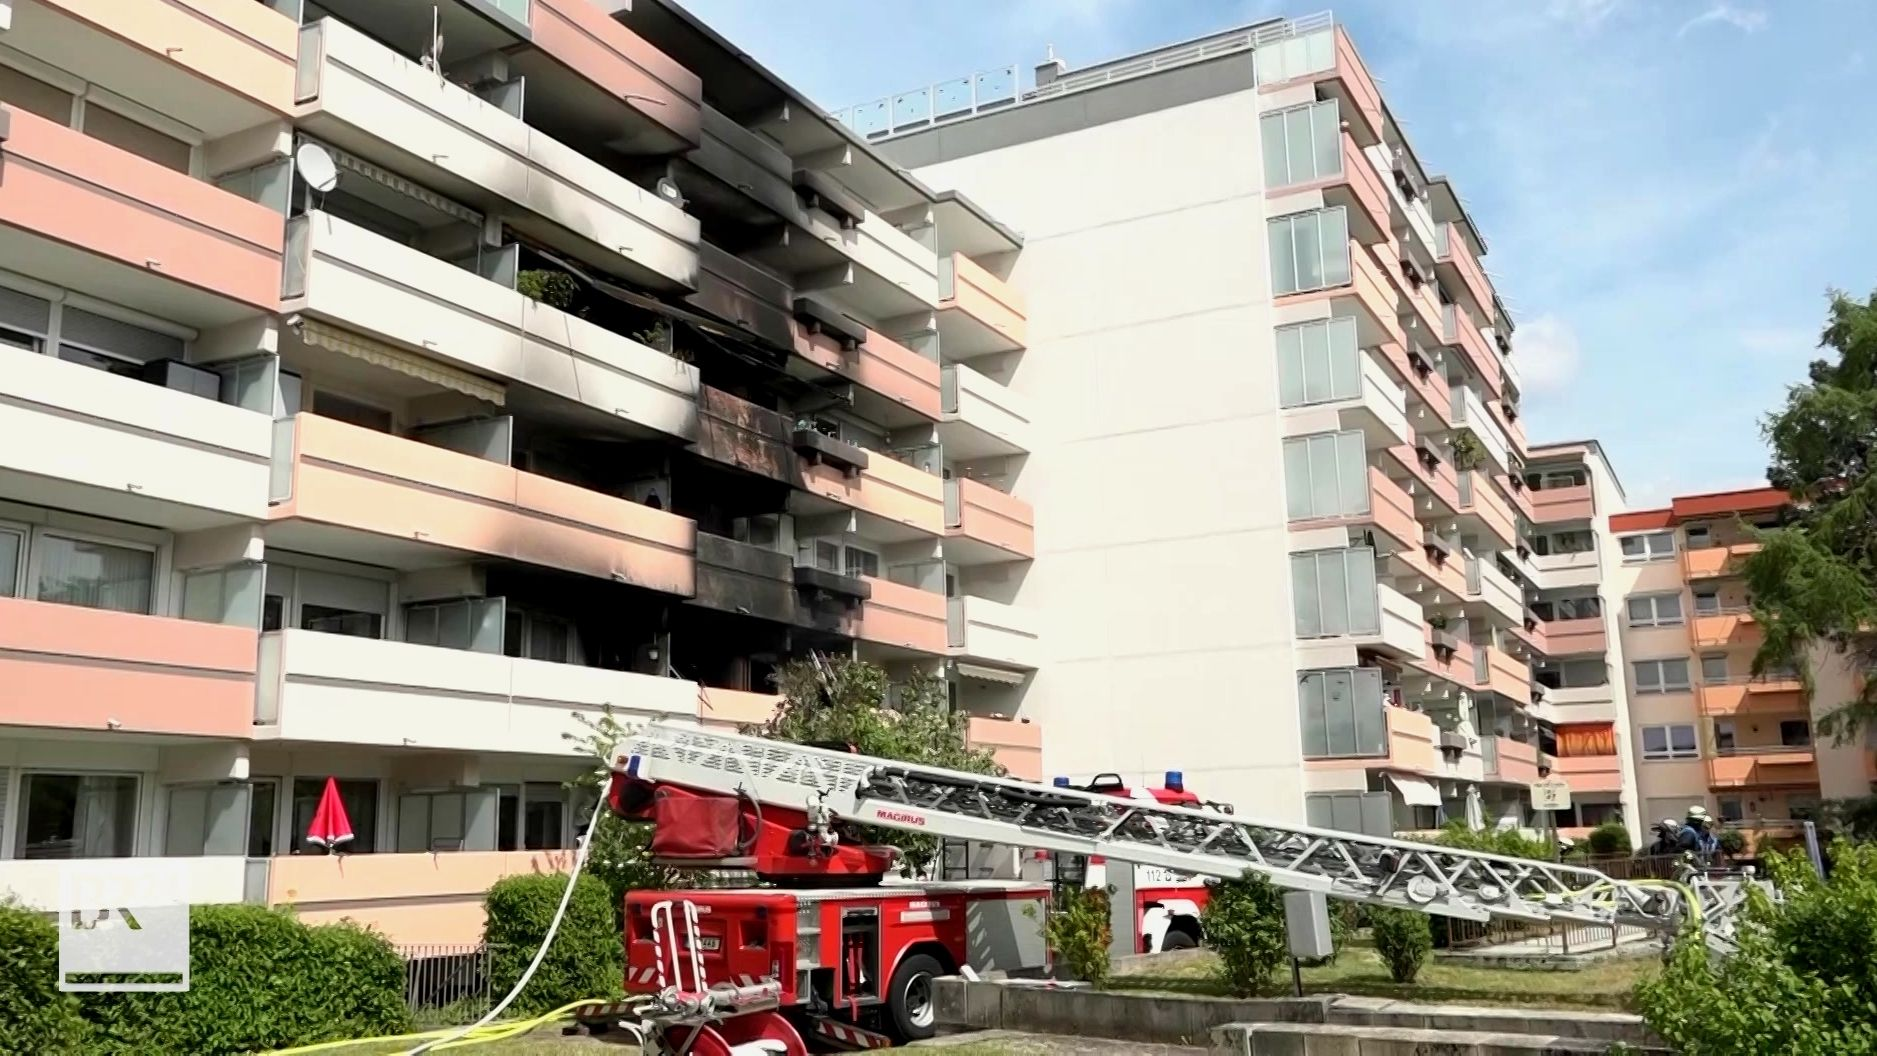 Wohnungsbrand in Nürnberg